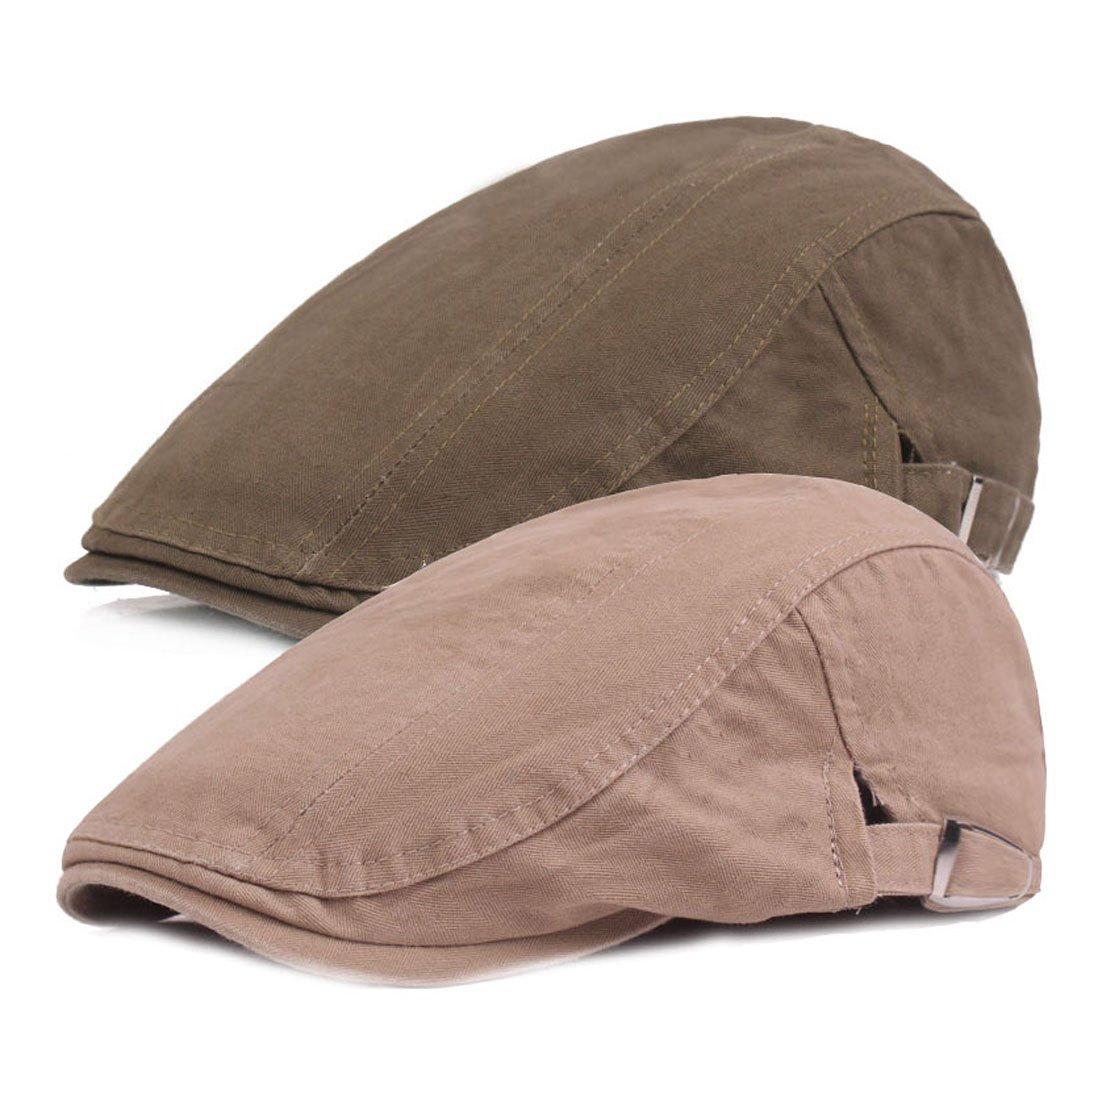 King Star 2 Pack Men Cotton Solid Ivy Irish Cabbie Newsboy Hat Scally Flat Caps Army Green Khaki